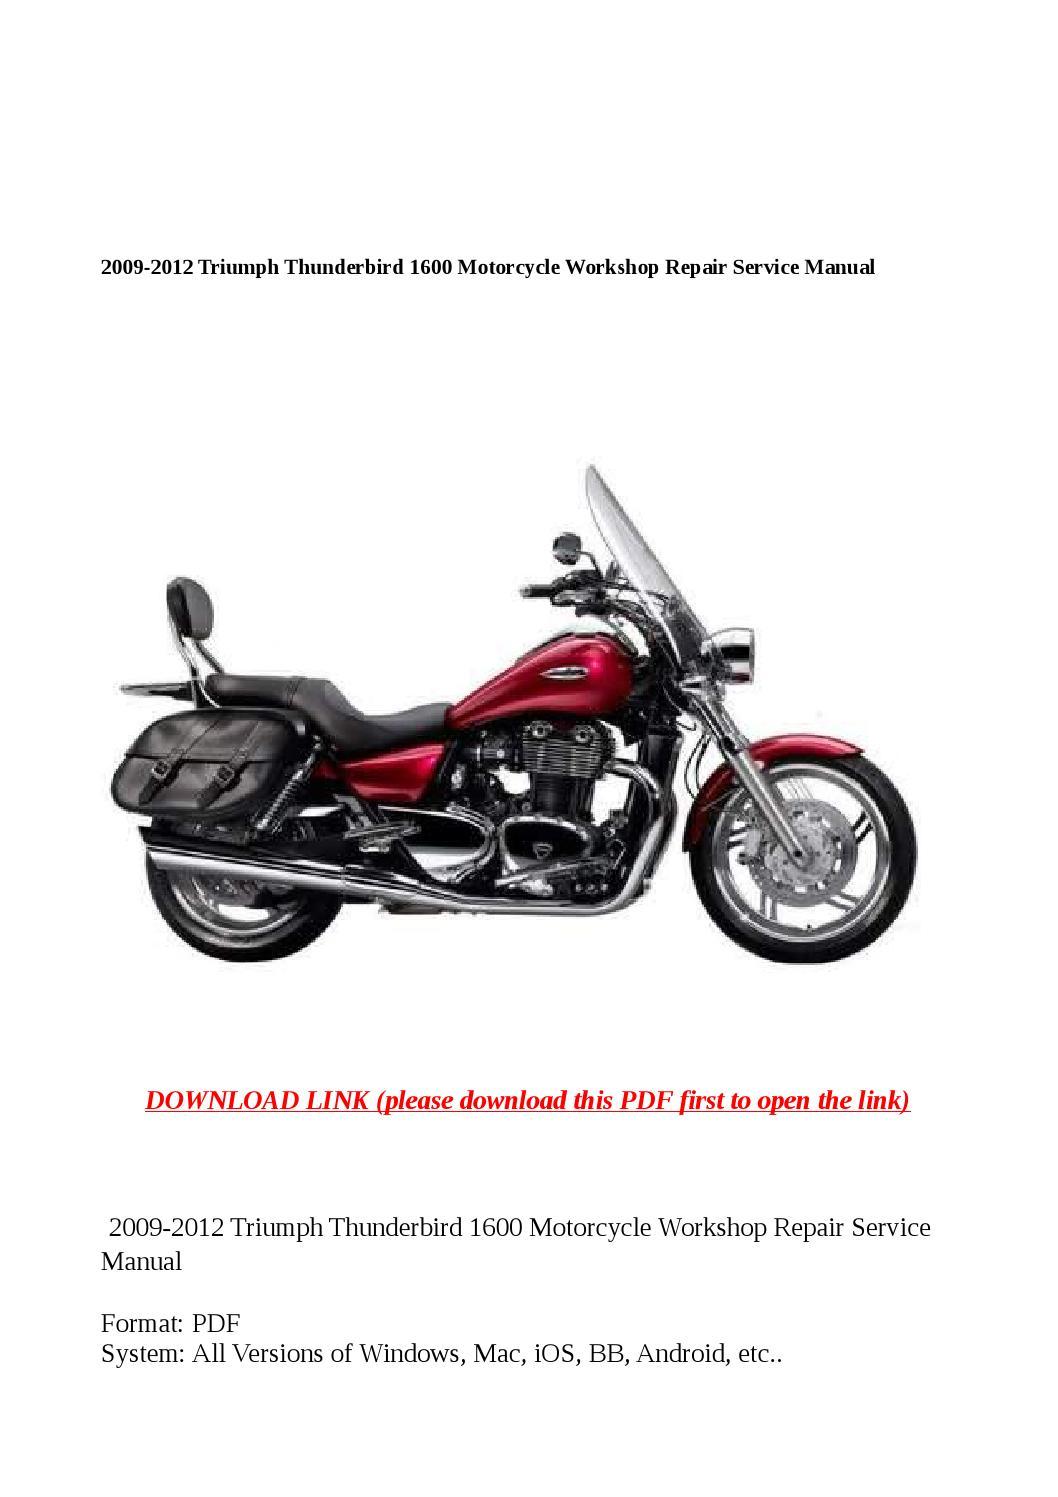 2009 2012 triumph thunderbird 1600 motorcycle workshop repair service manual by zrbhtdryjun6